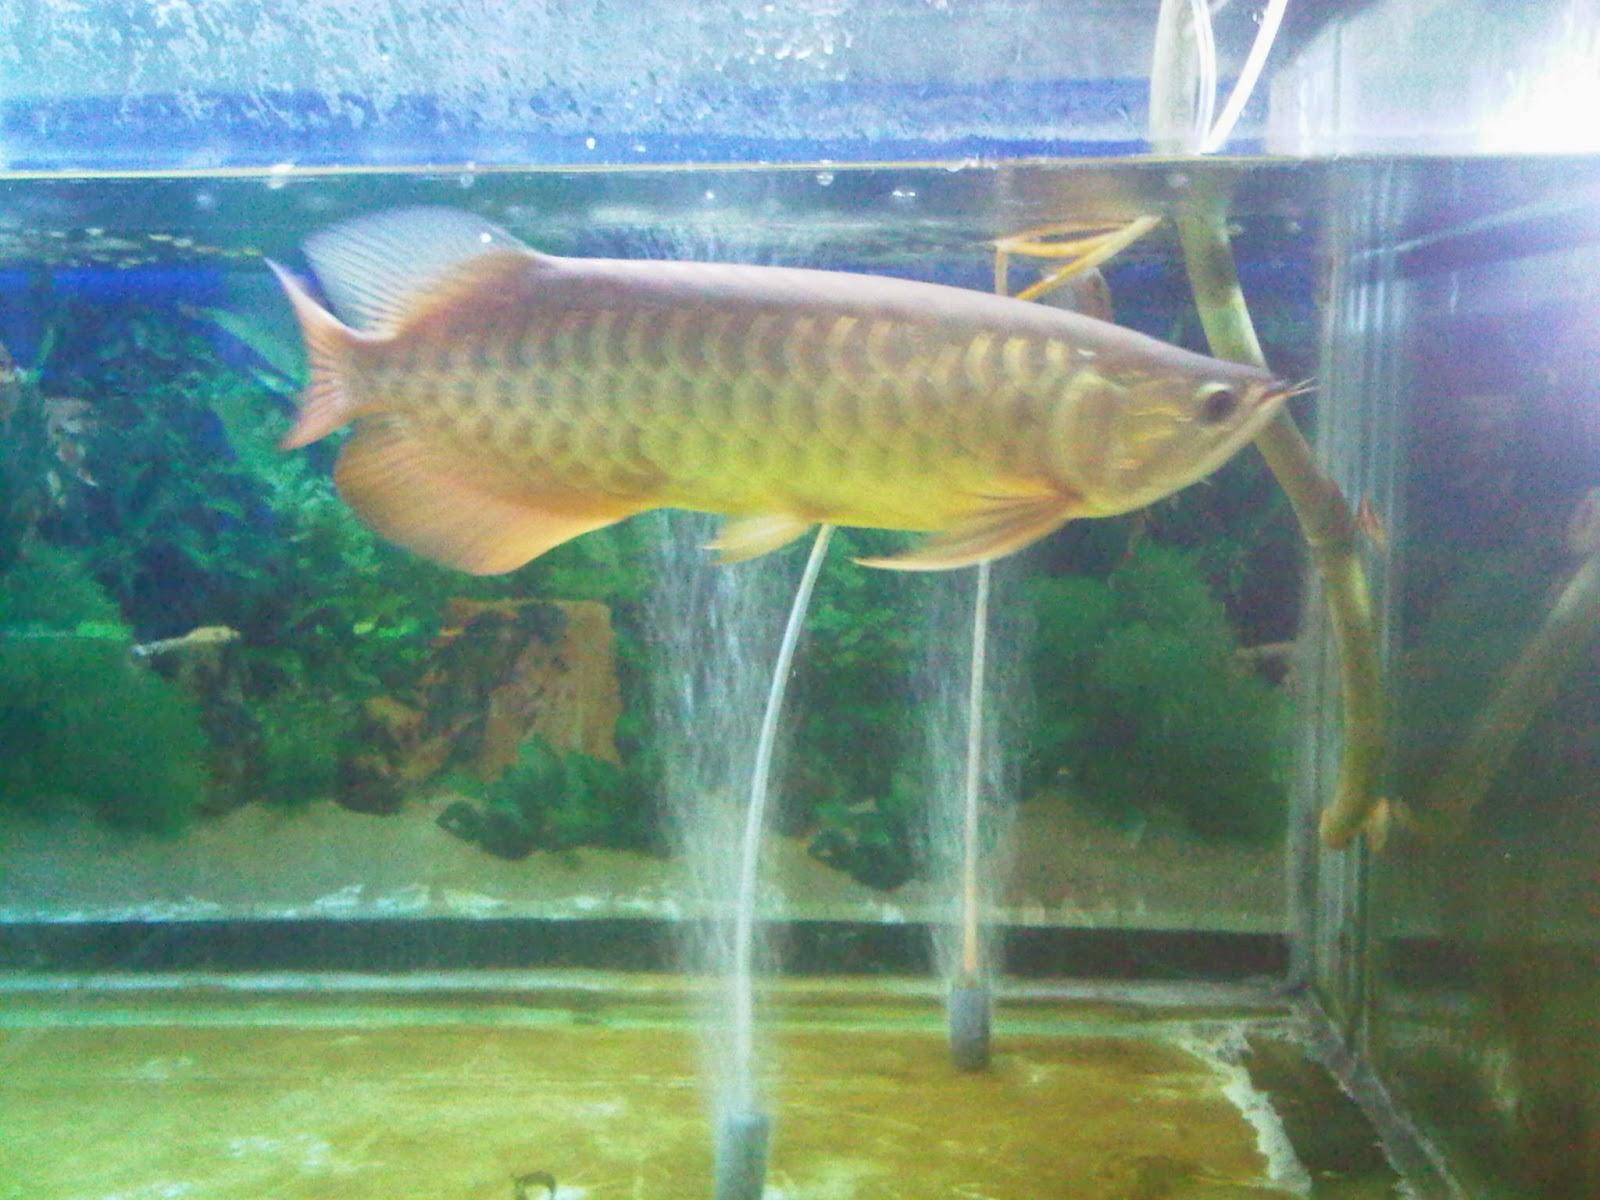 ARWANA FISH DEPOK: Desember 2013